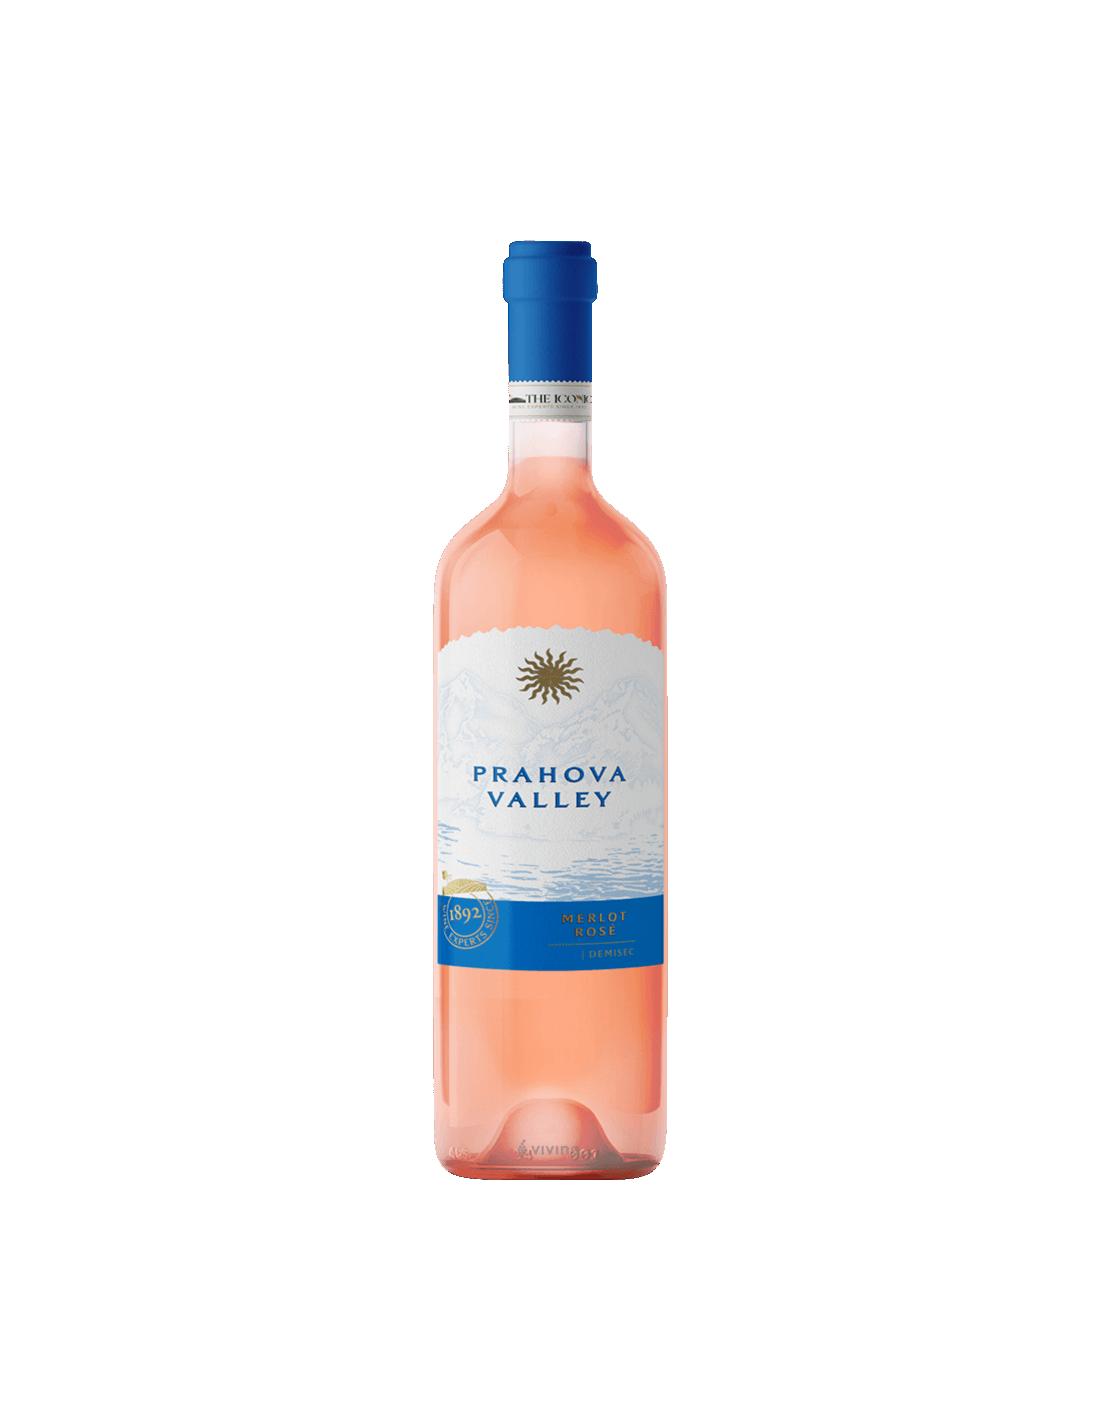 Vin roze demisec, Merlot, Prahova Valley + tirbuson, 13% alc., 0.75L, Romania